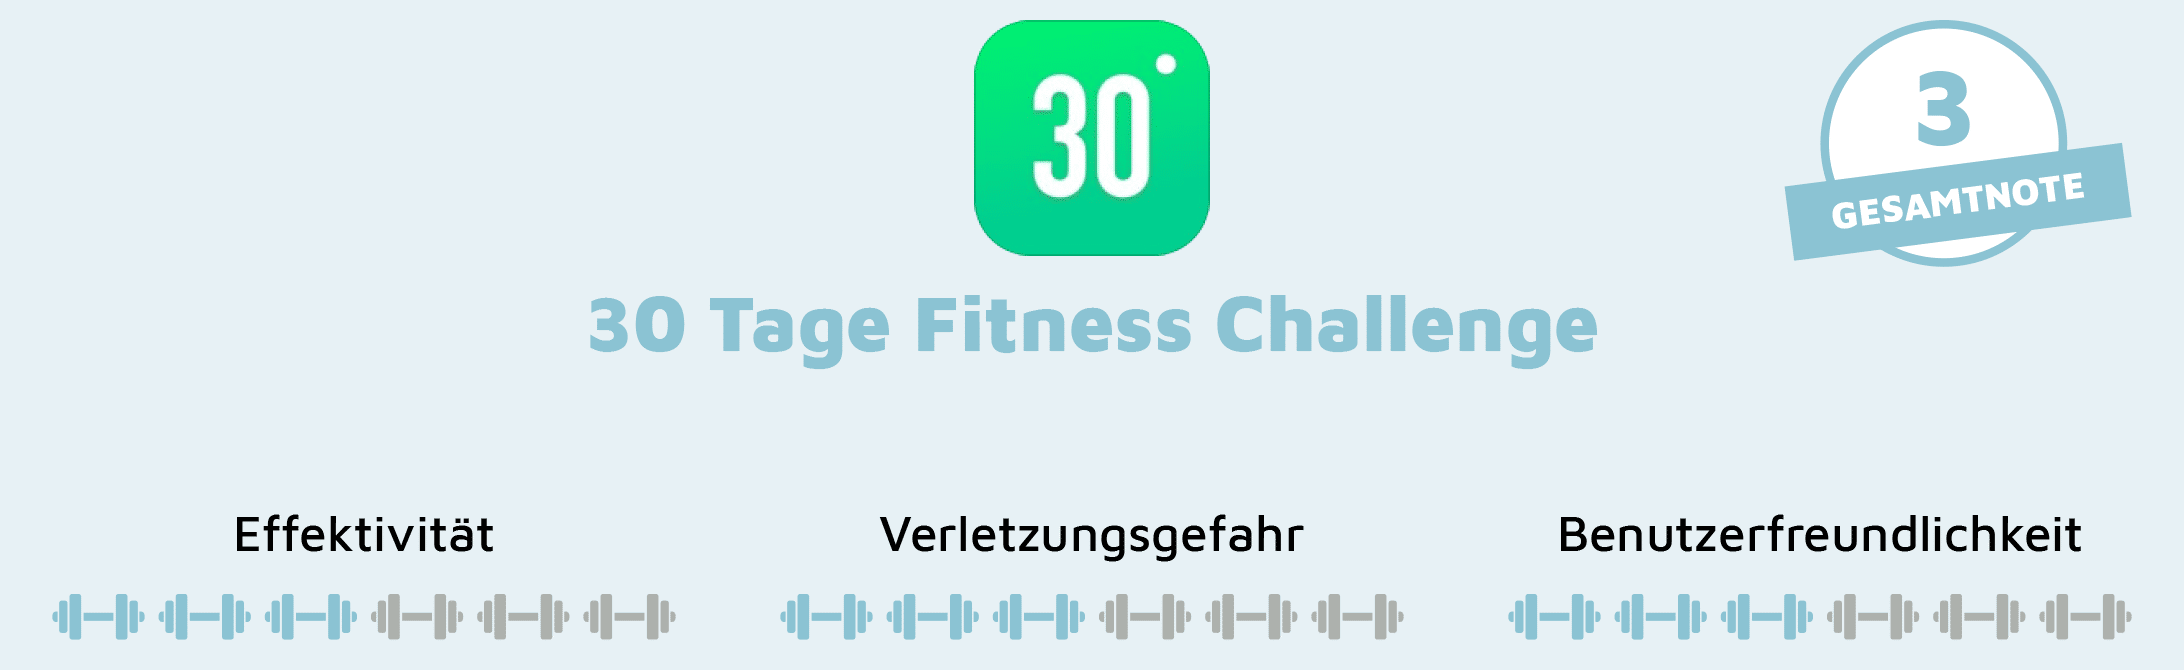 Fazit der App 30-Tage